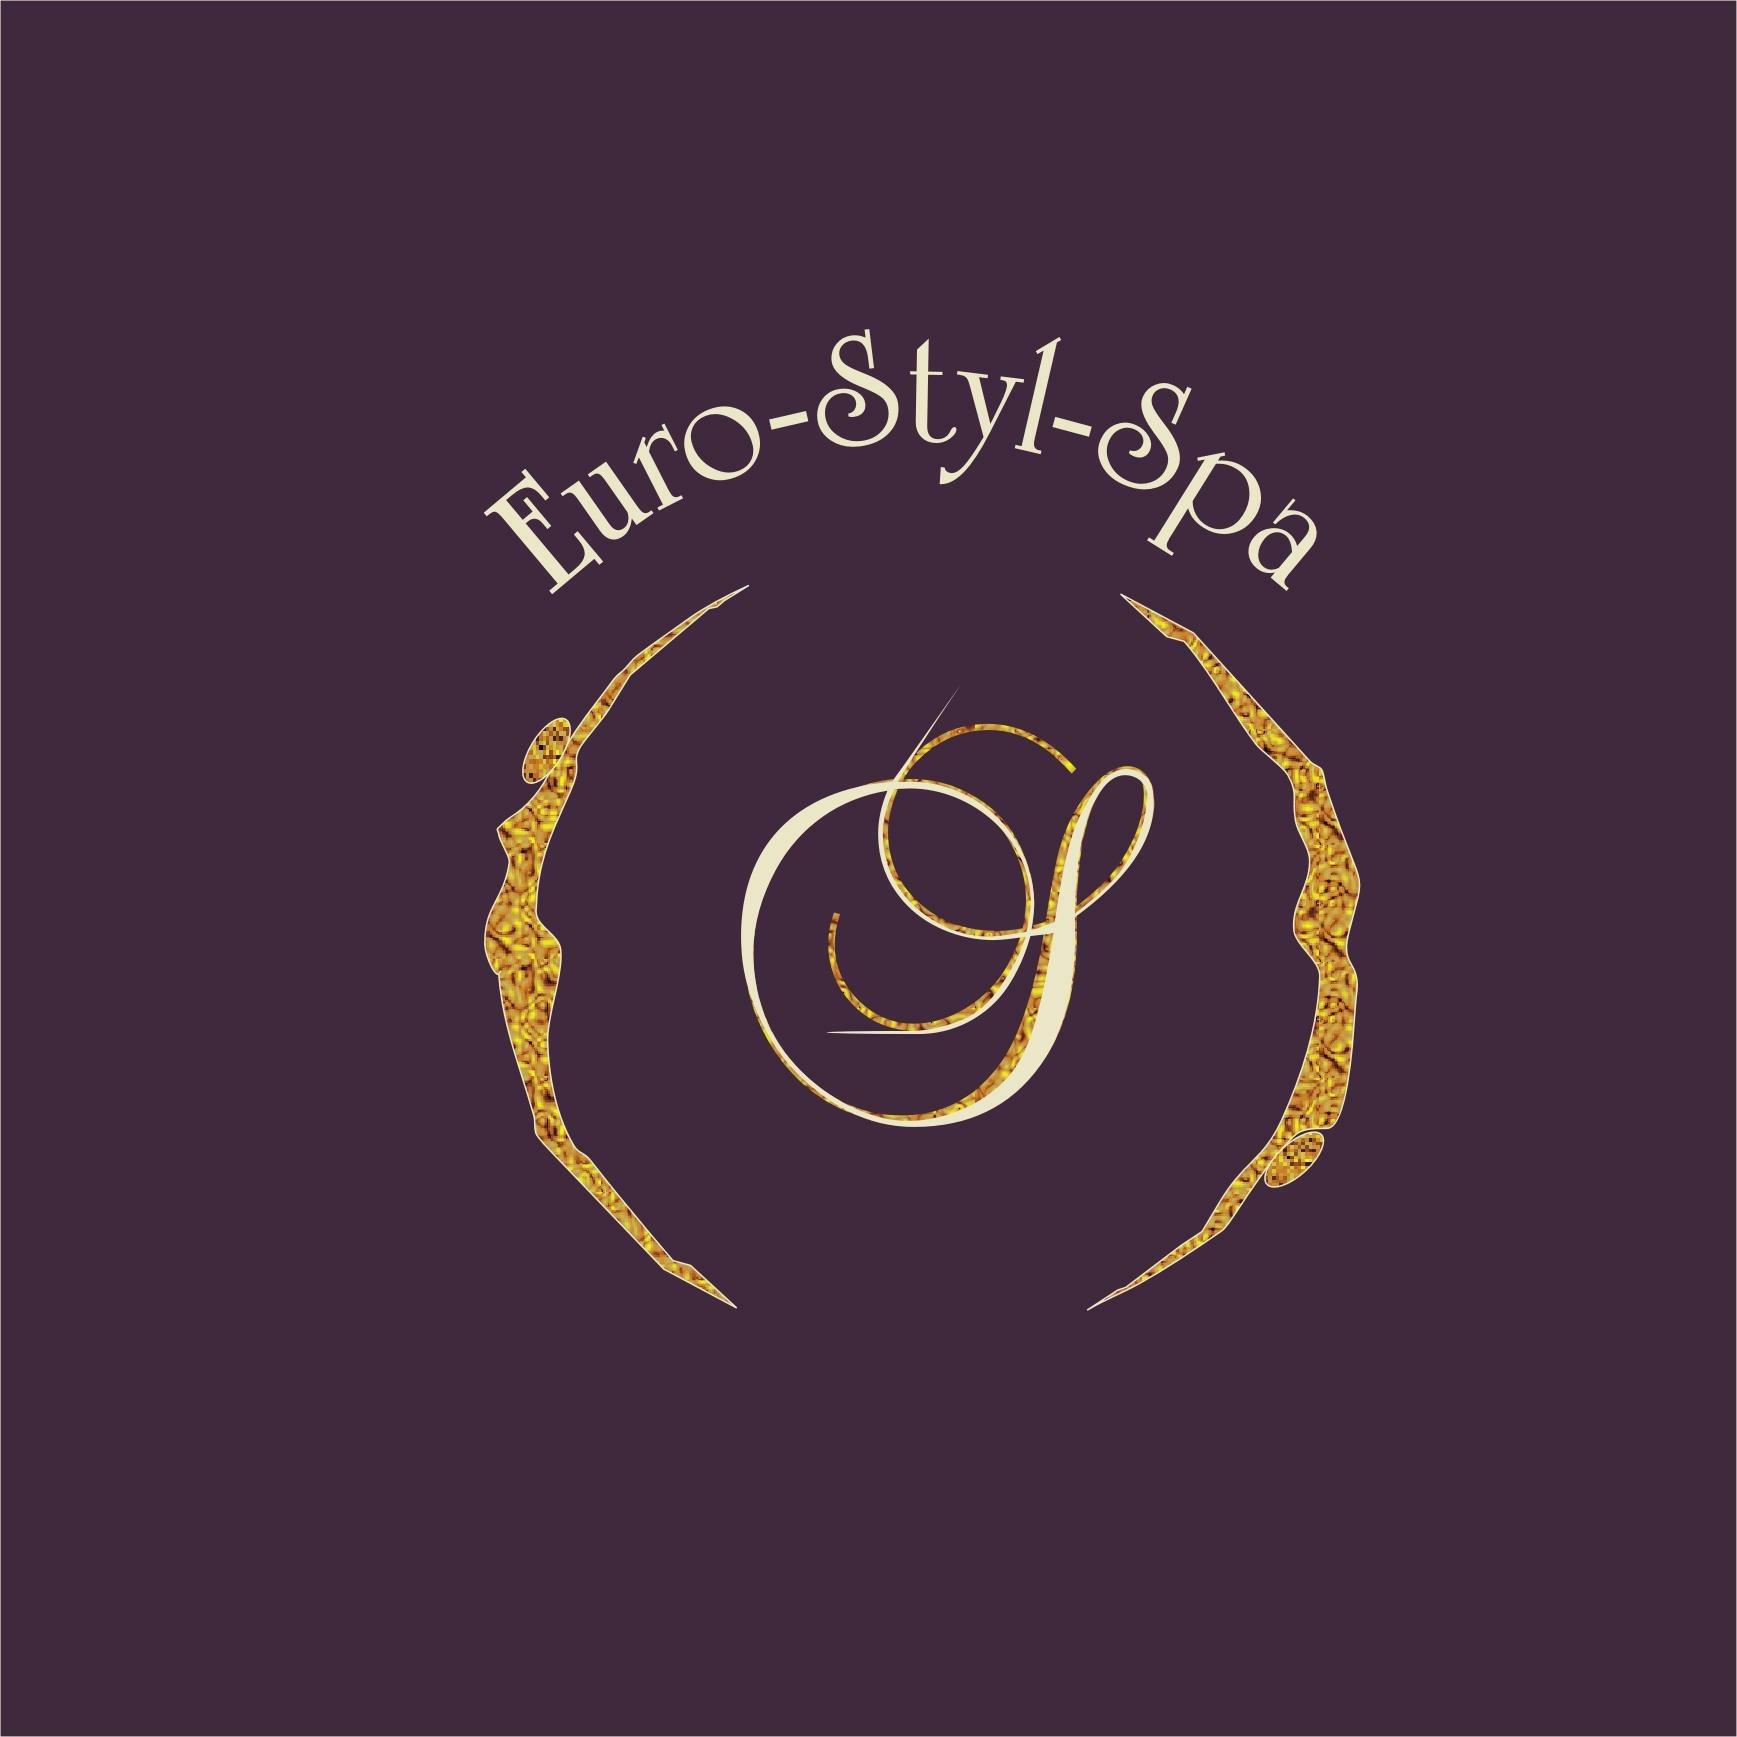 Euro-Styl- Spa